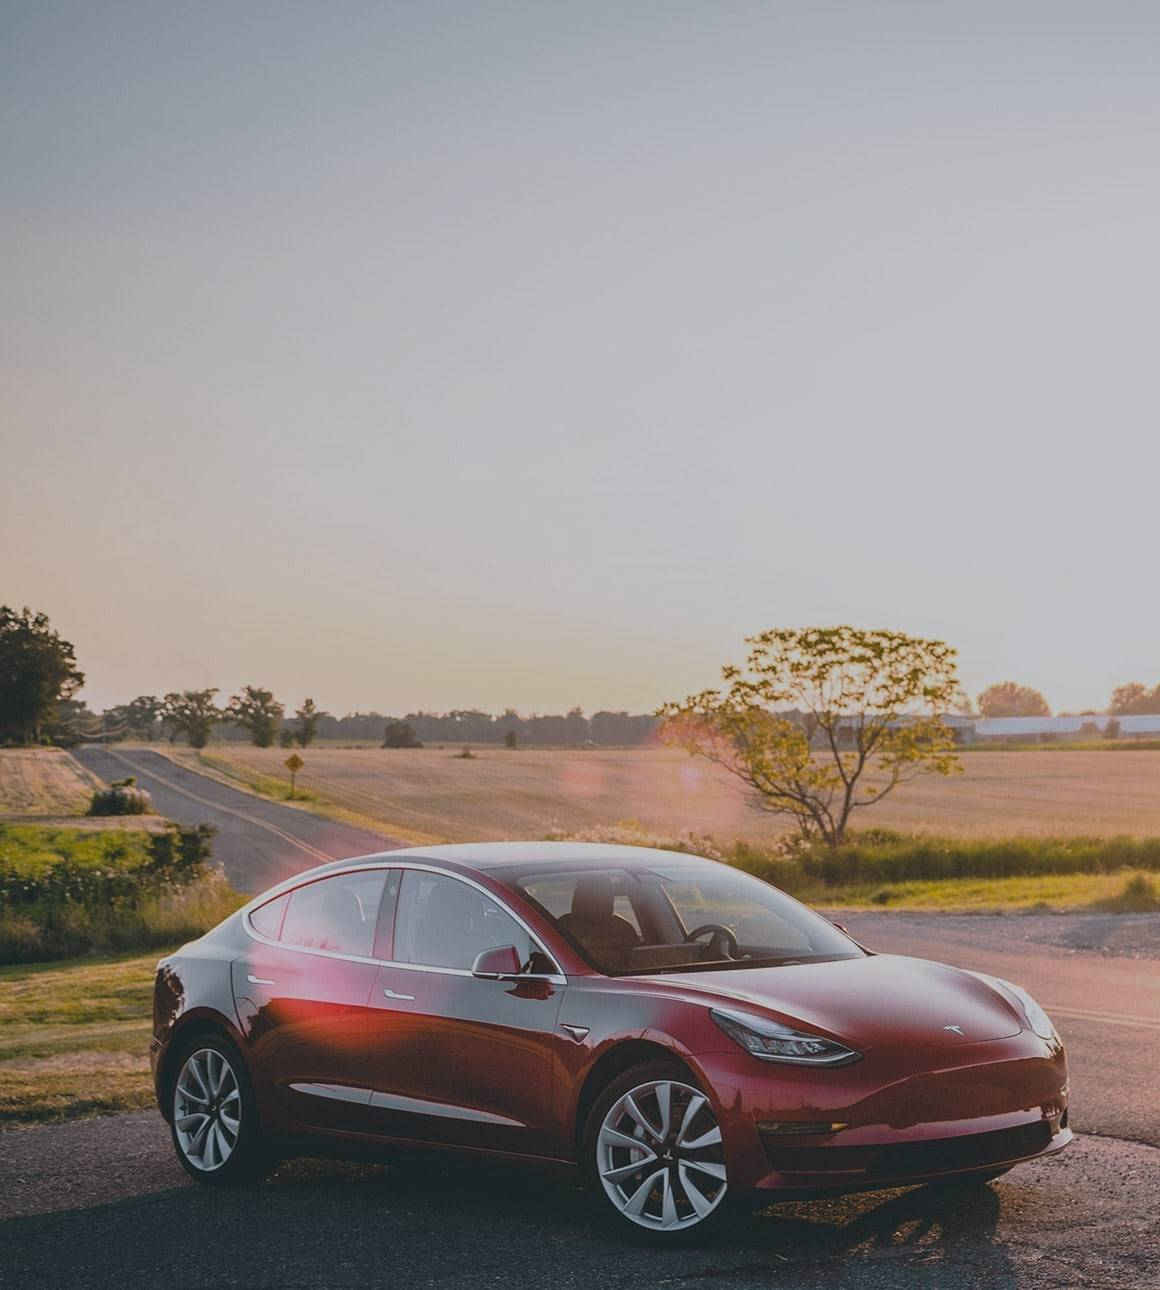 Tesla Car Finance Deals & Loans - Car.co.uk